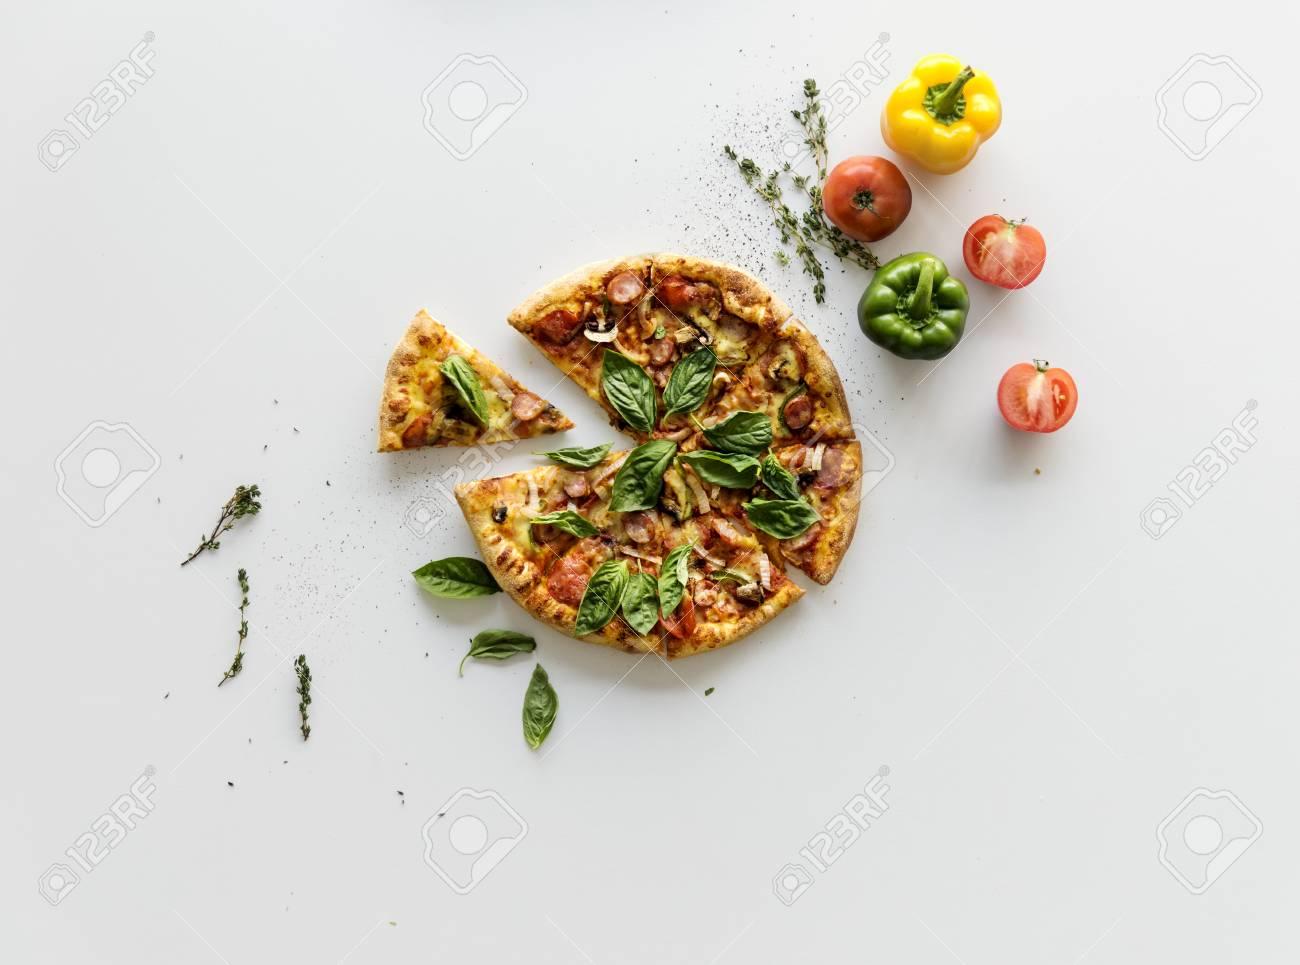 Groß Louisiana Pizza Küche New Orleans Carrollton Galerie - Ideen ...